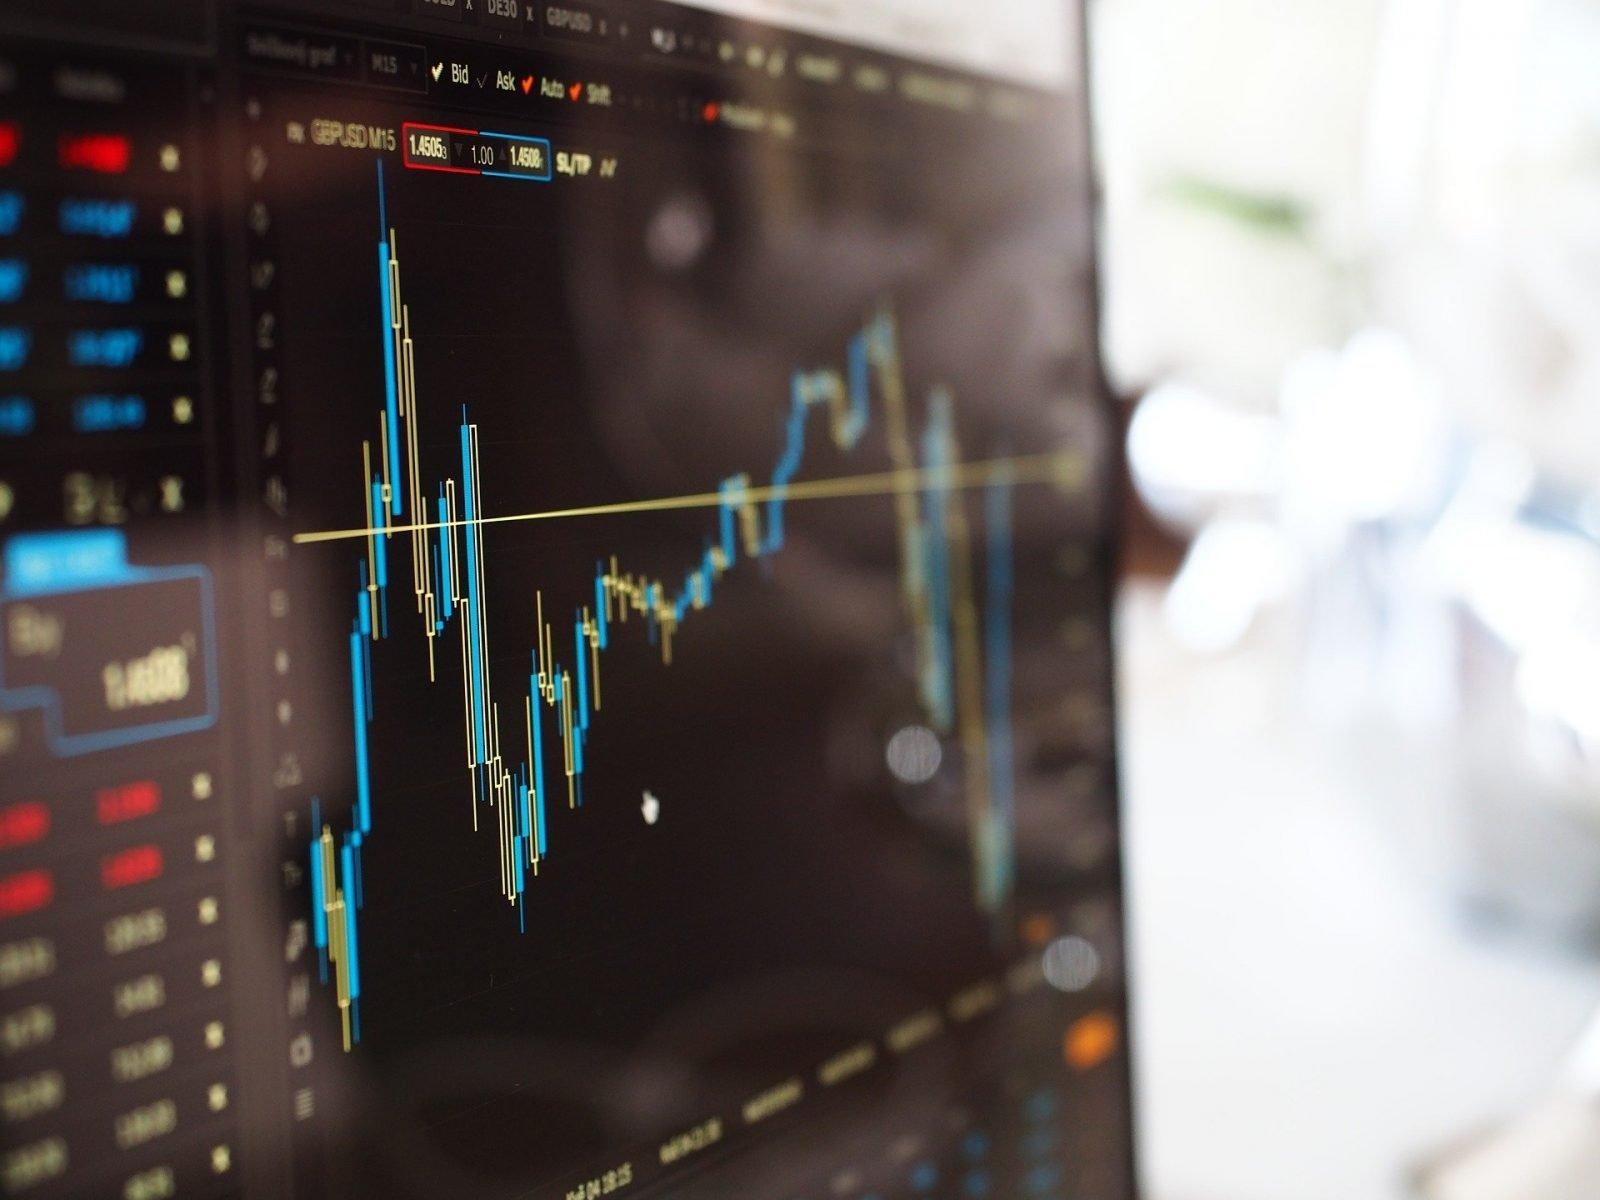 Stock Trading - Paul Scolardi